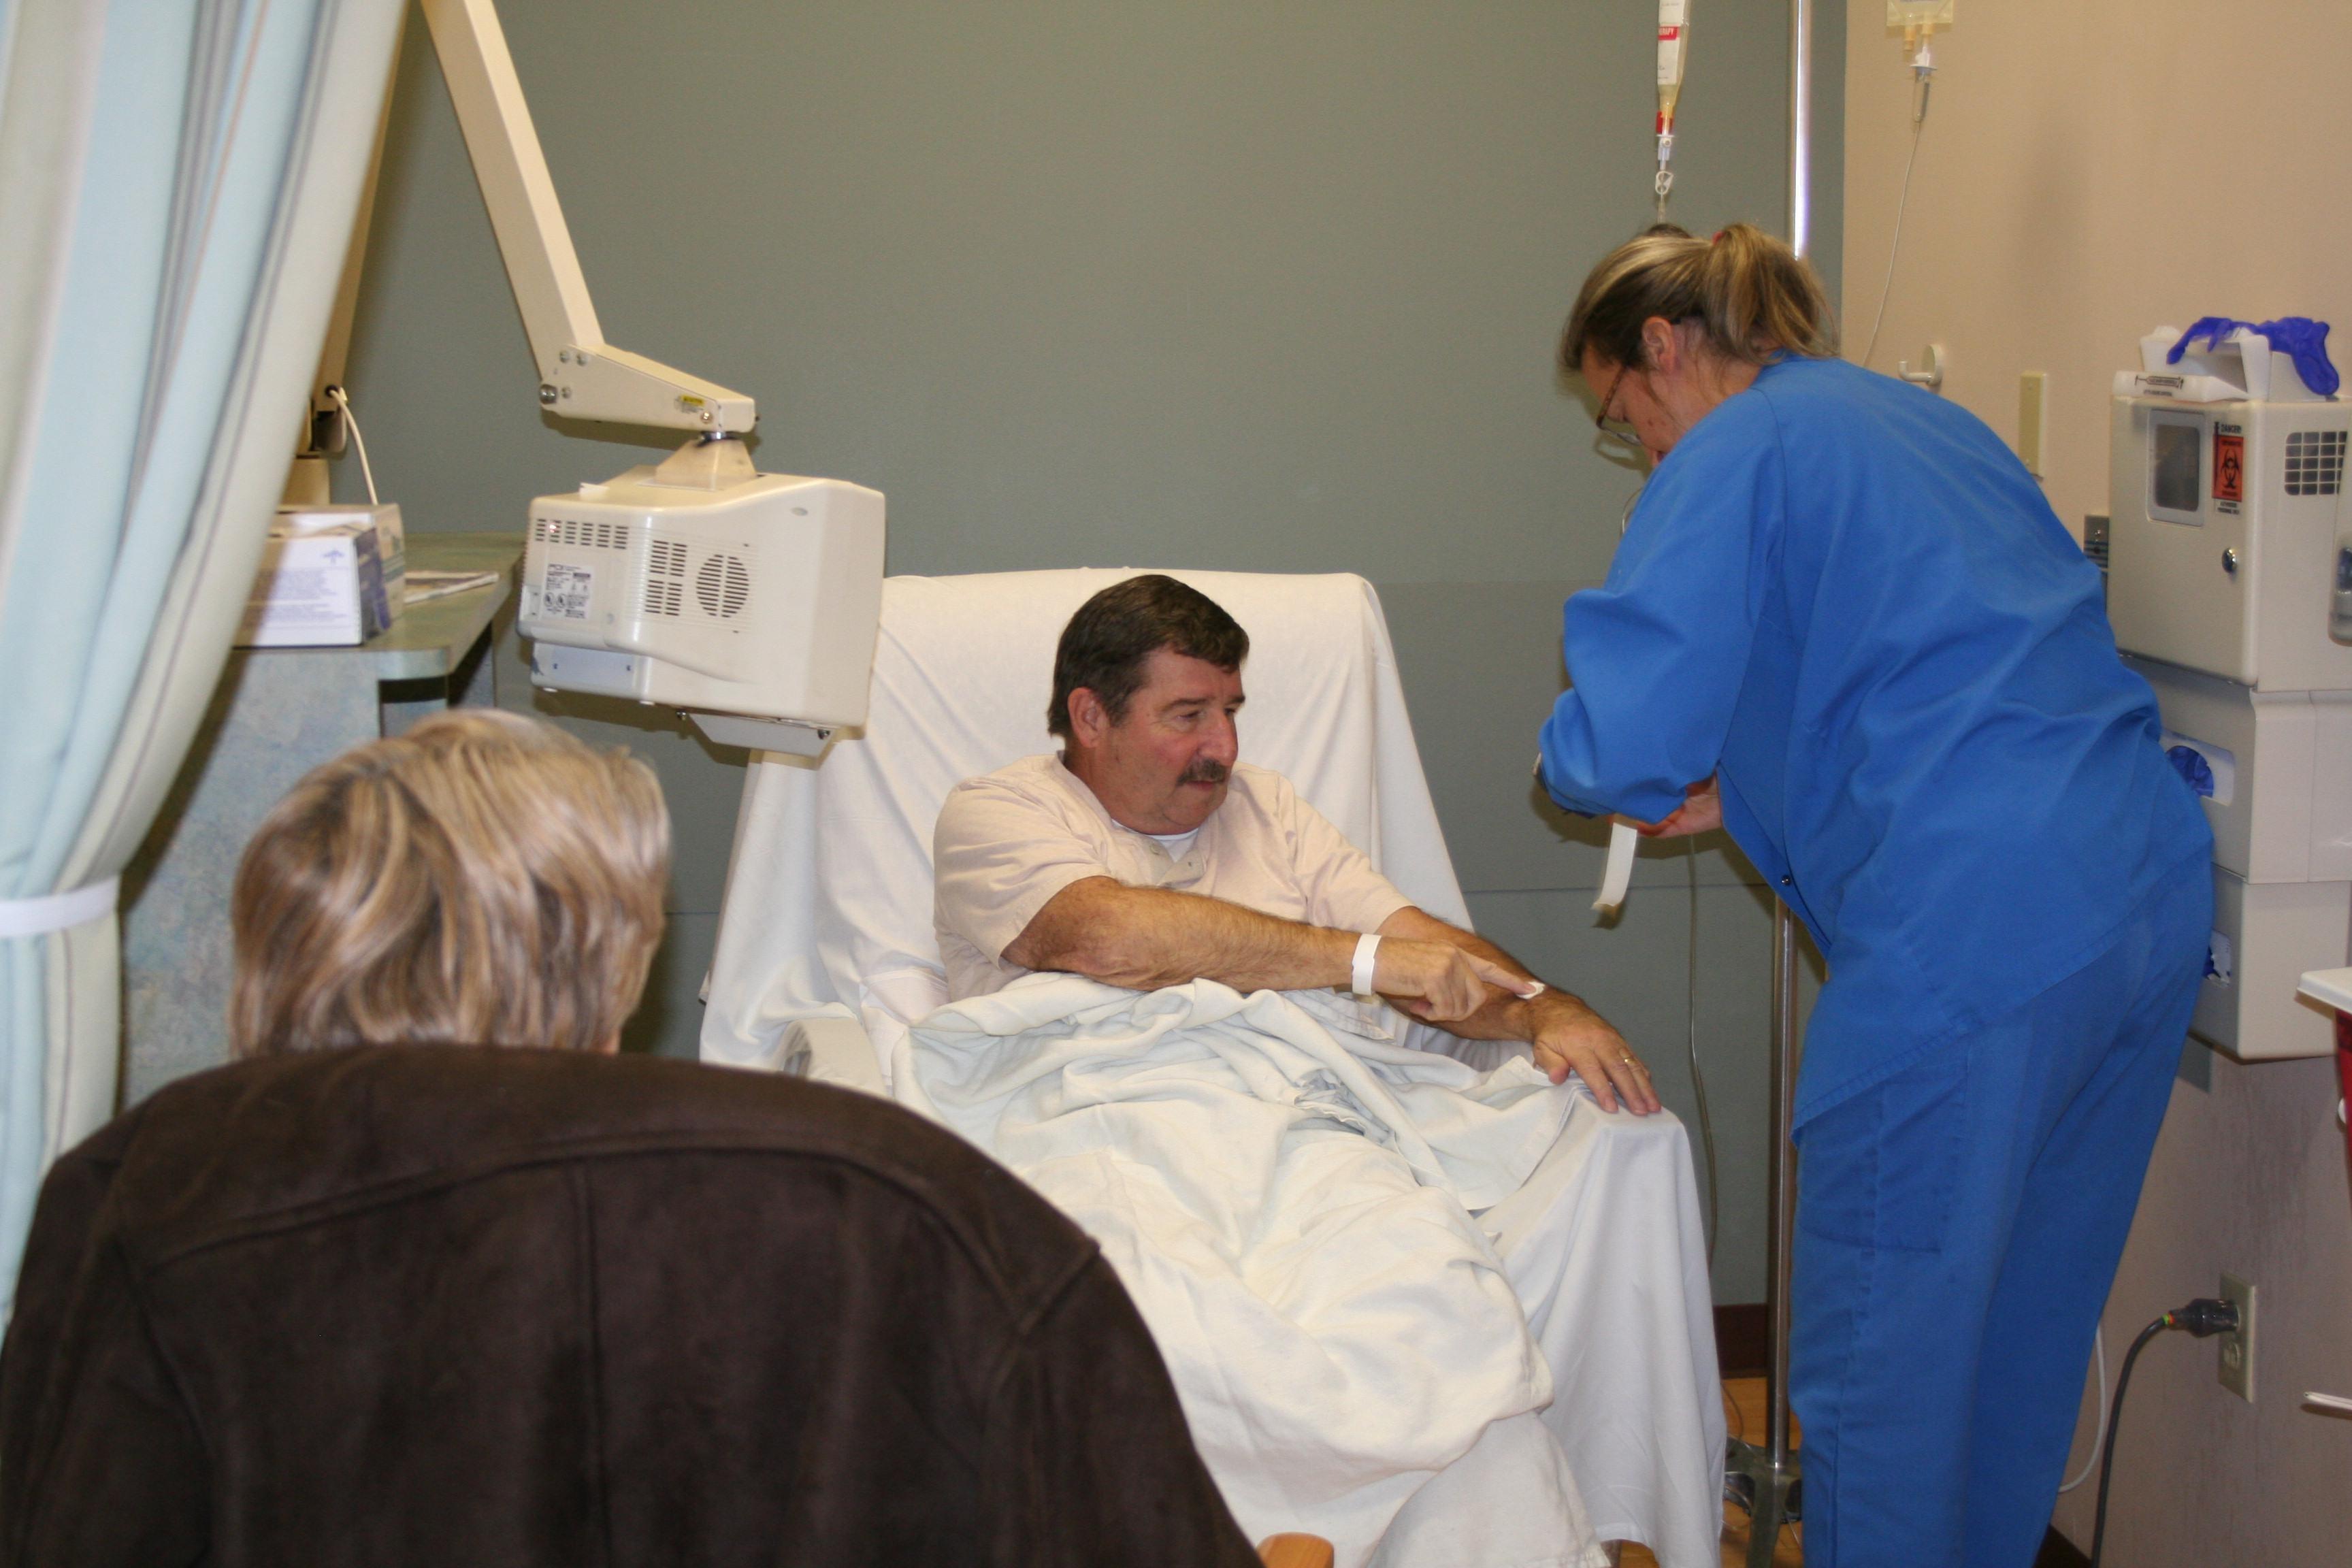 Photo courtesy of CAMC. Hurricane resident Steve Sovine receives treatment at the David Lee Cancer Center.